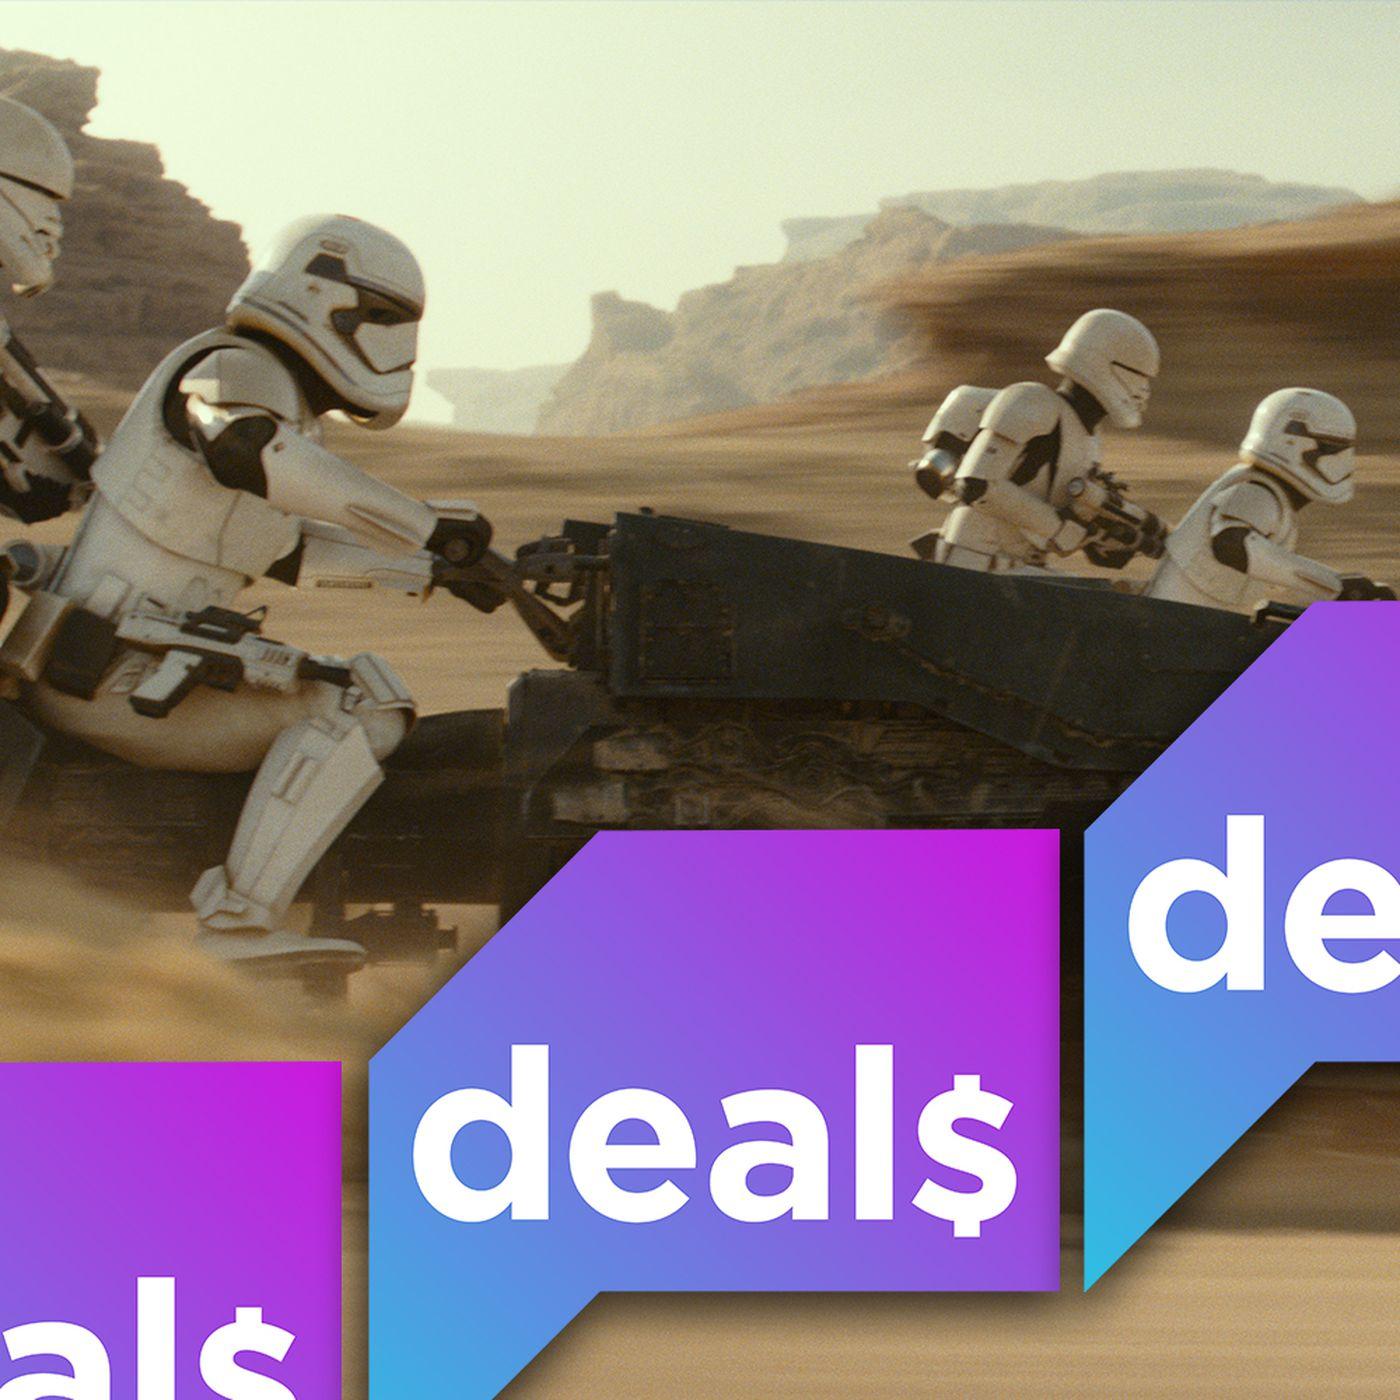 Best Gaming Deals Star Wars 4k Bundle Nintendo Switch Lite At